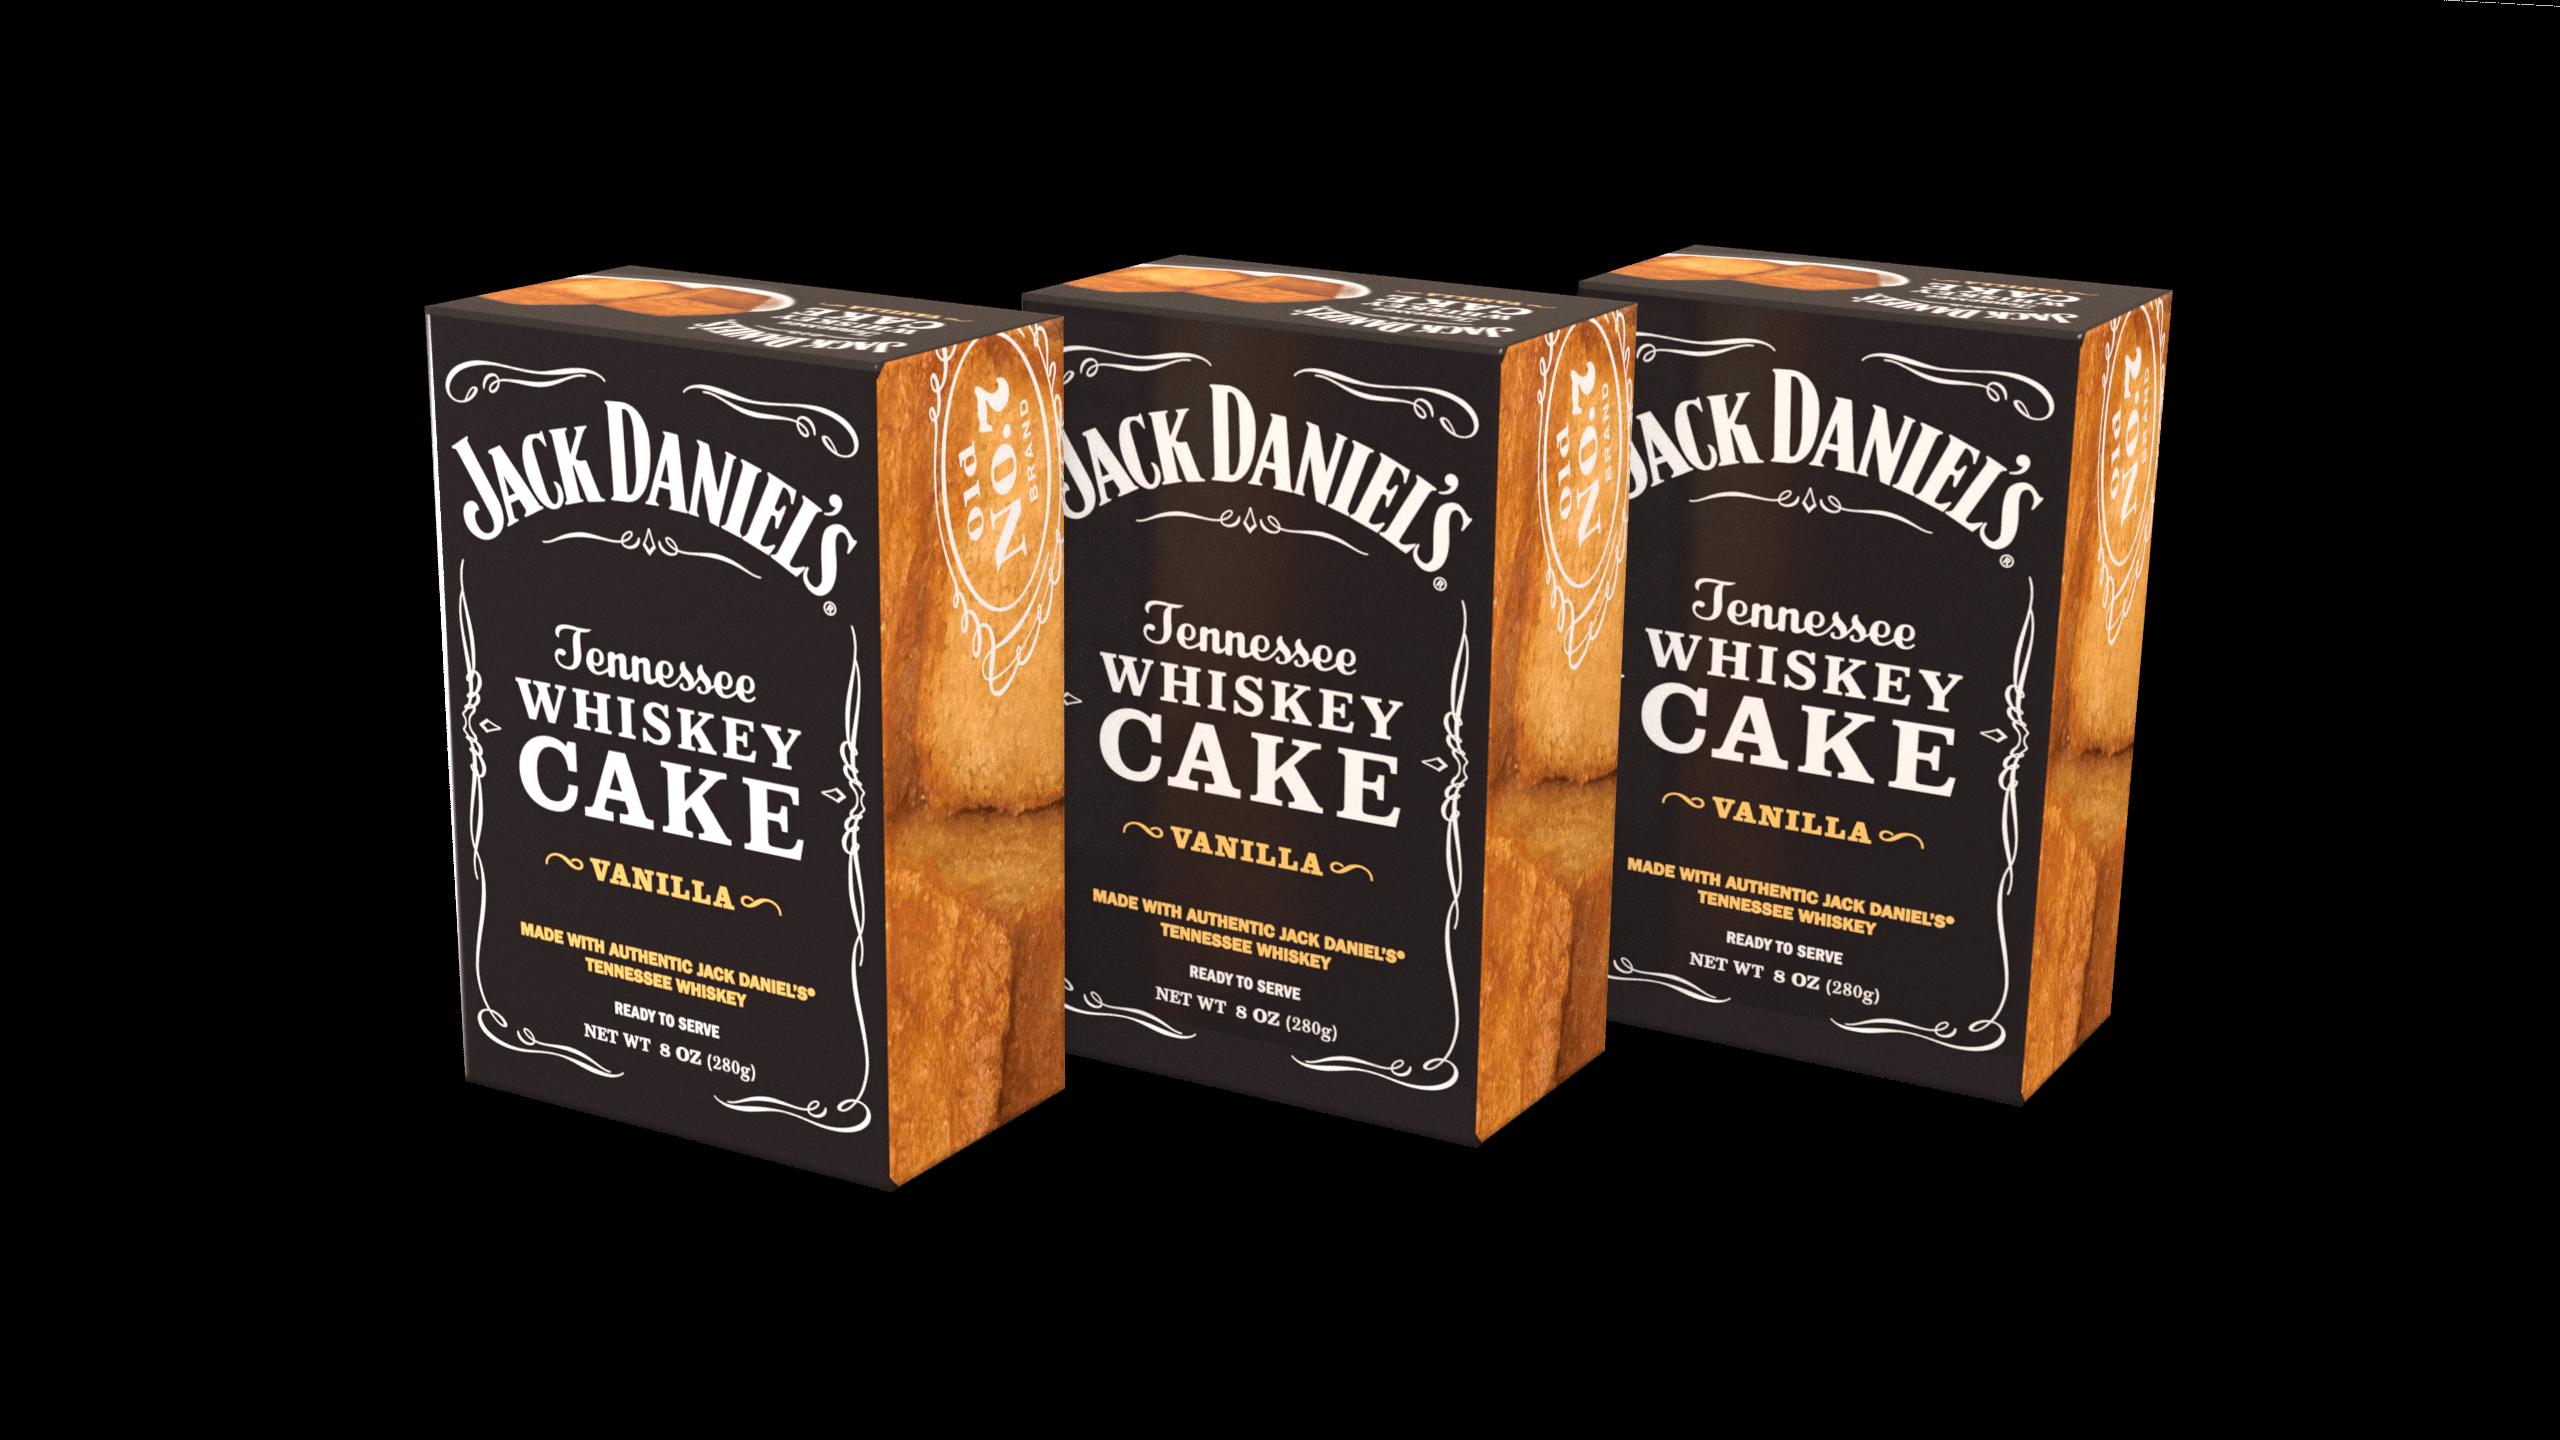 3-Pack of Jack Daniel's Tennessee Whiskey Cake - Vanilla JD308VNL